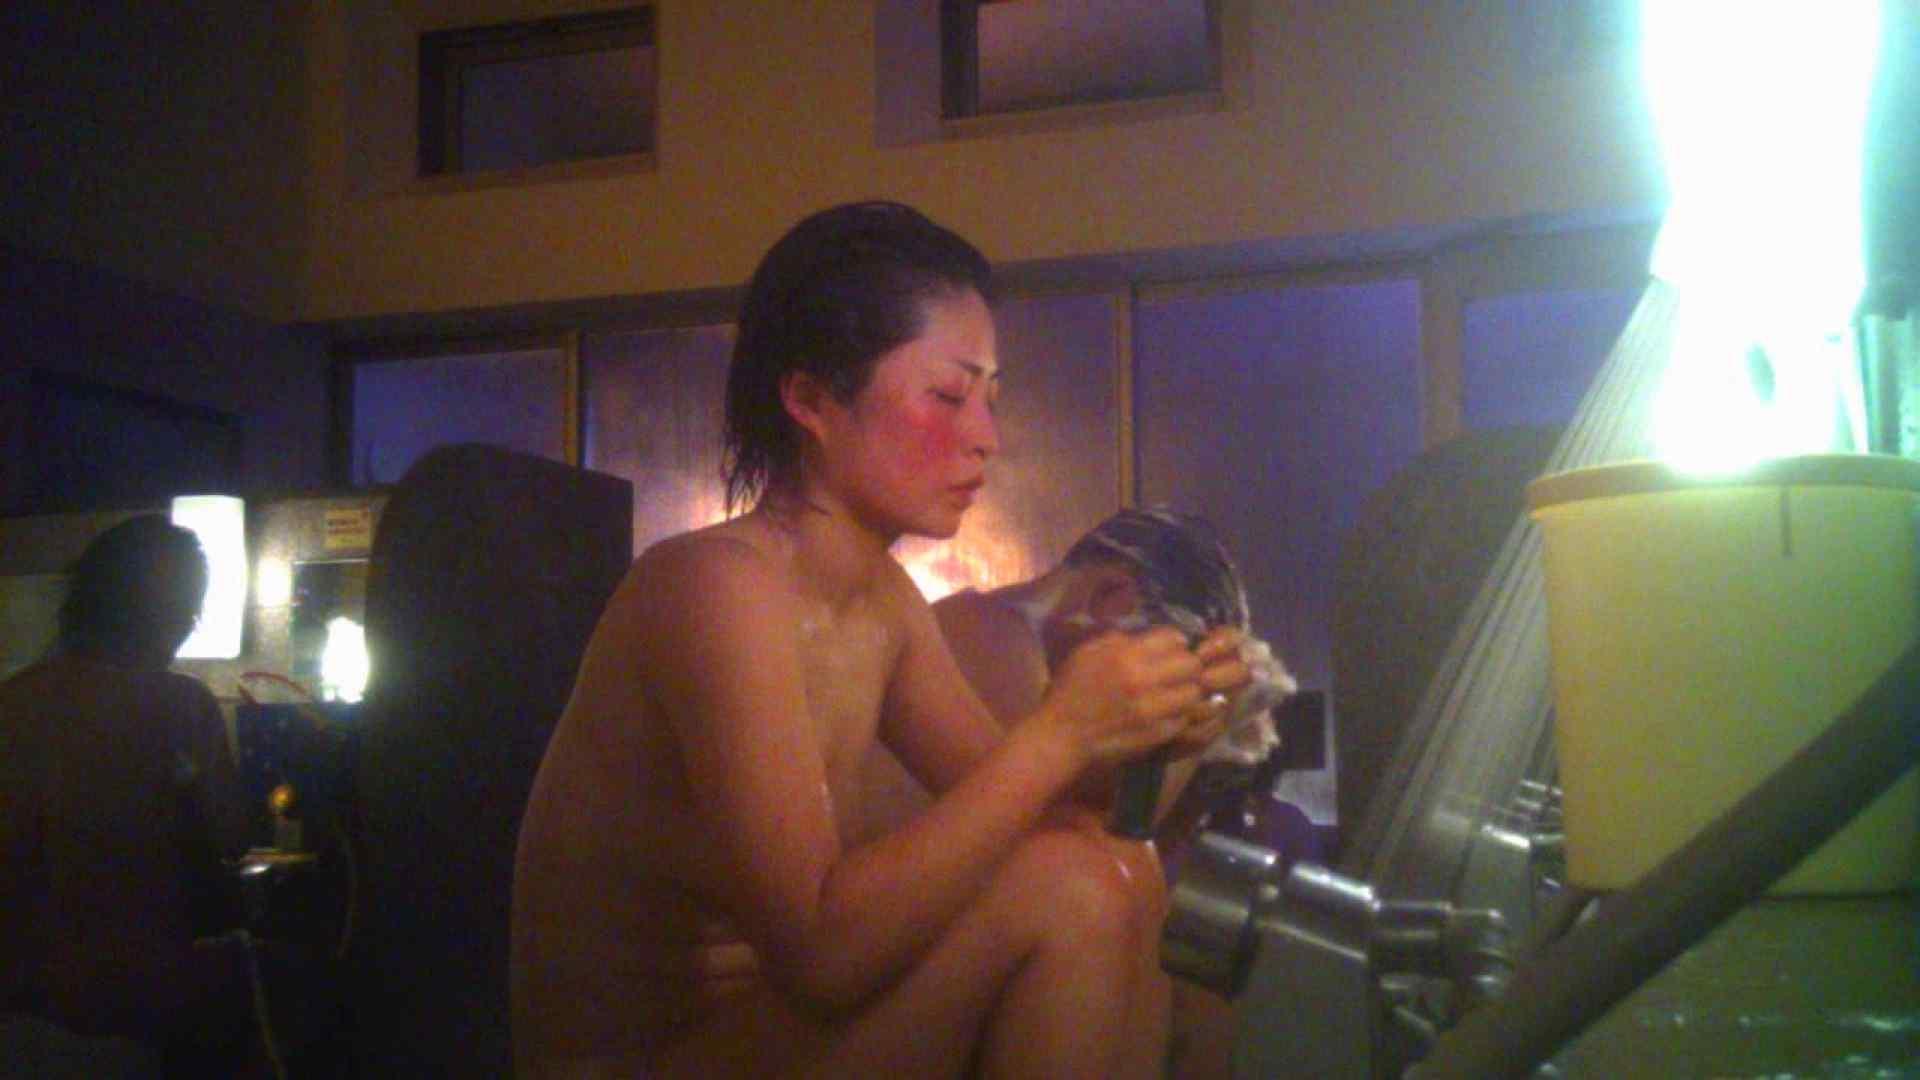 TG.21 【上等兵】井戸端会議が大好きな奥さん 潜入 性交動画流出 69画像 62